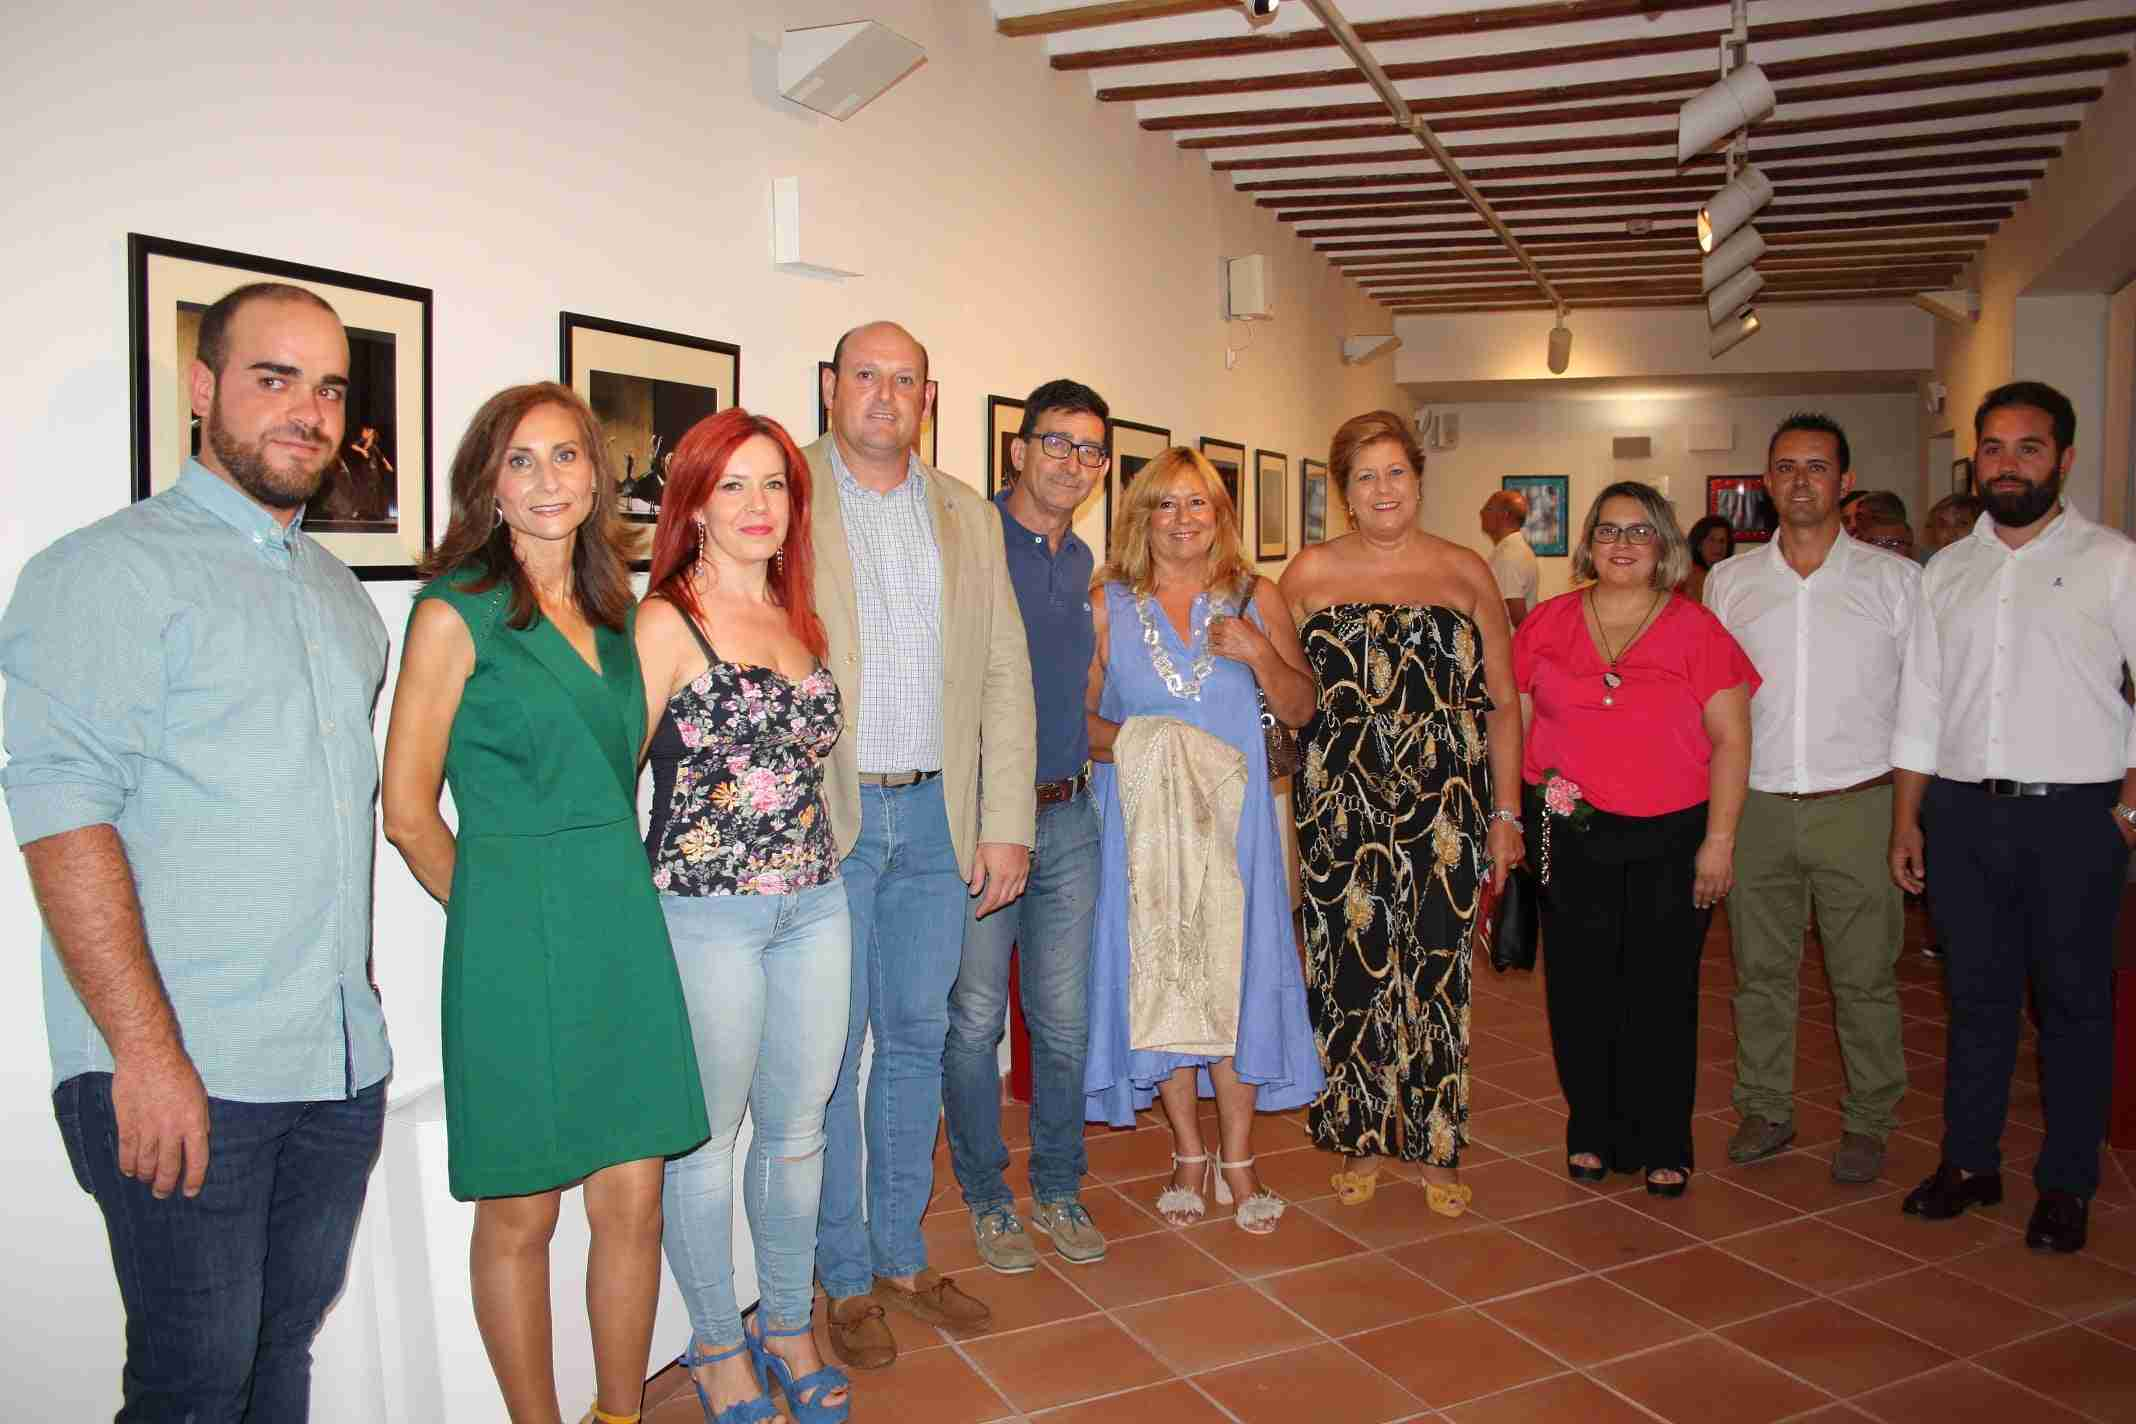 Merecido homenaje a Manuel Canseco, en el 9º Festival de Teatro y Títeres de Torralba de Calatrava 2